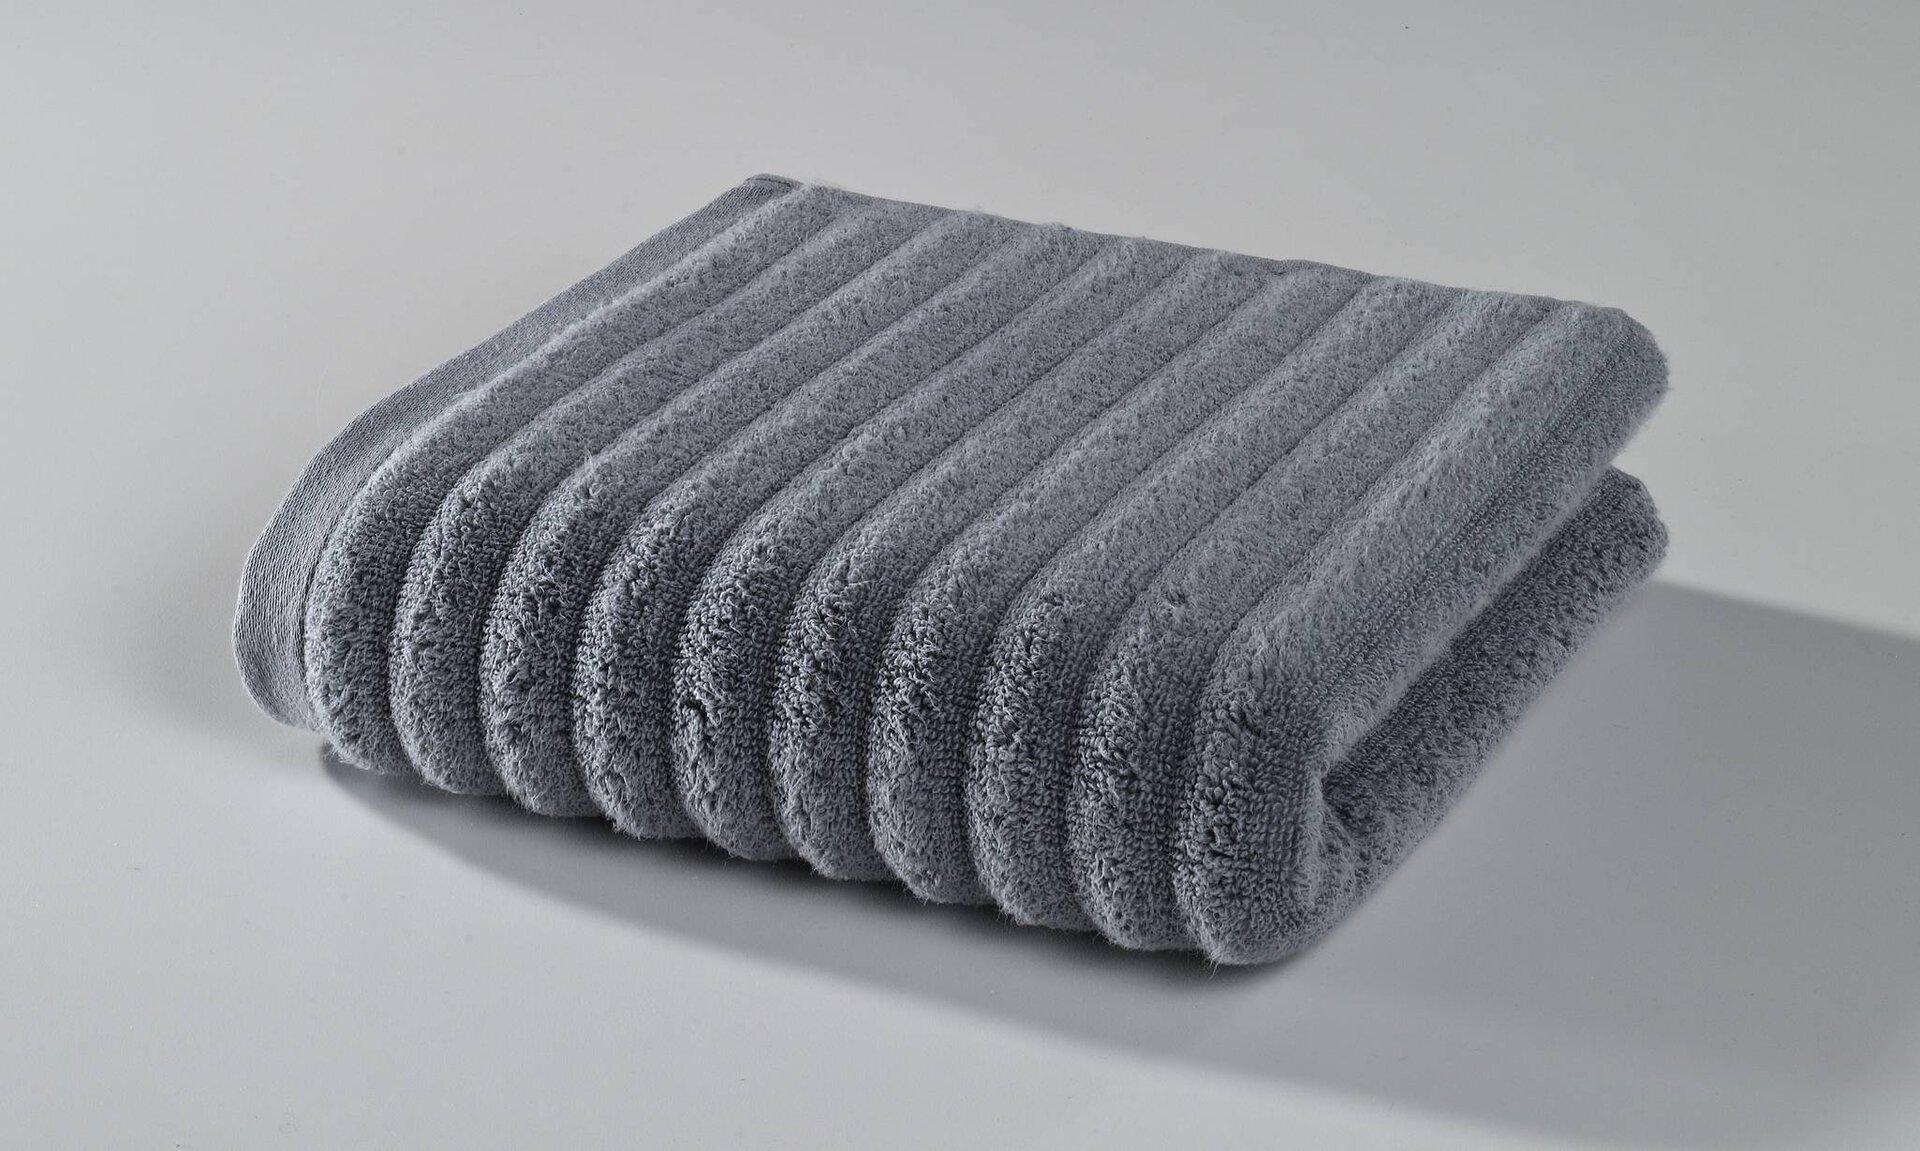 Handtuch Enjoy Kenborg Textil grau 50 x 100 cm